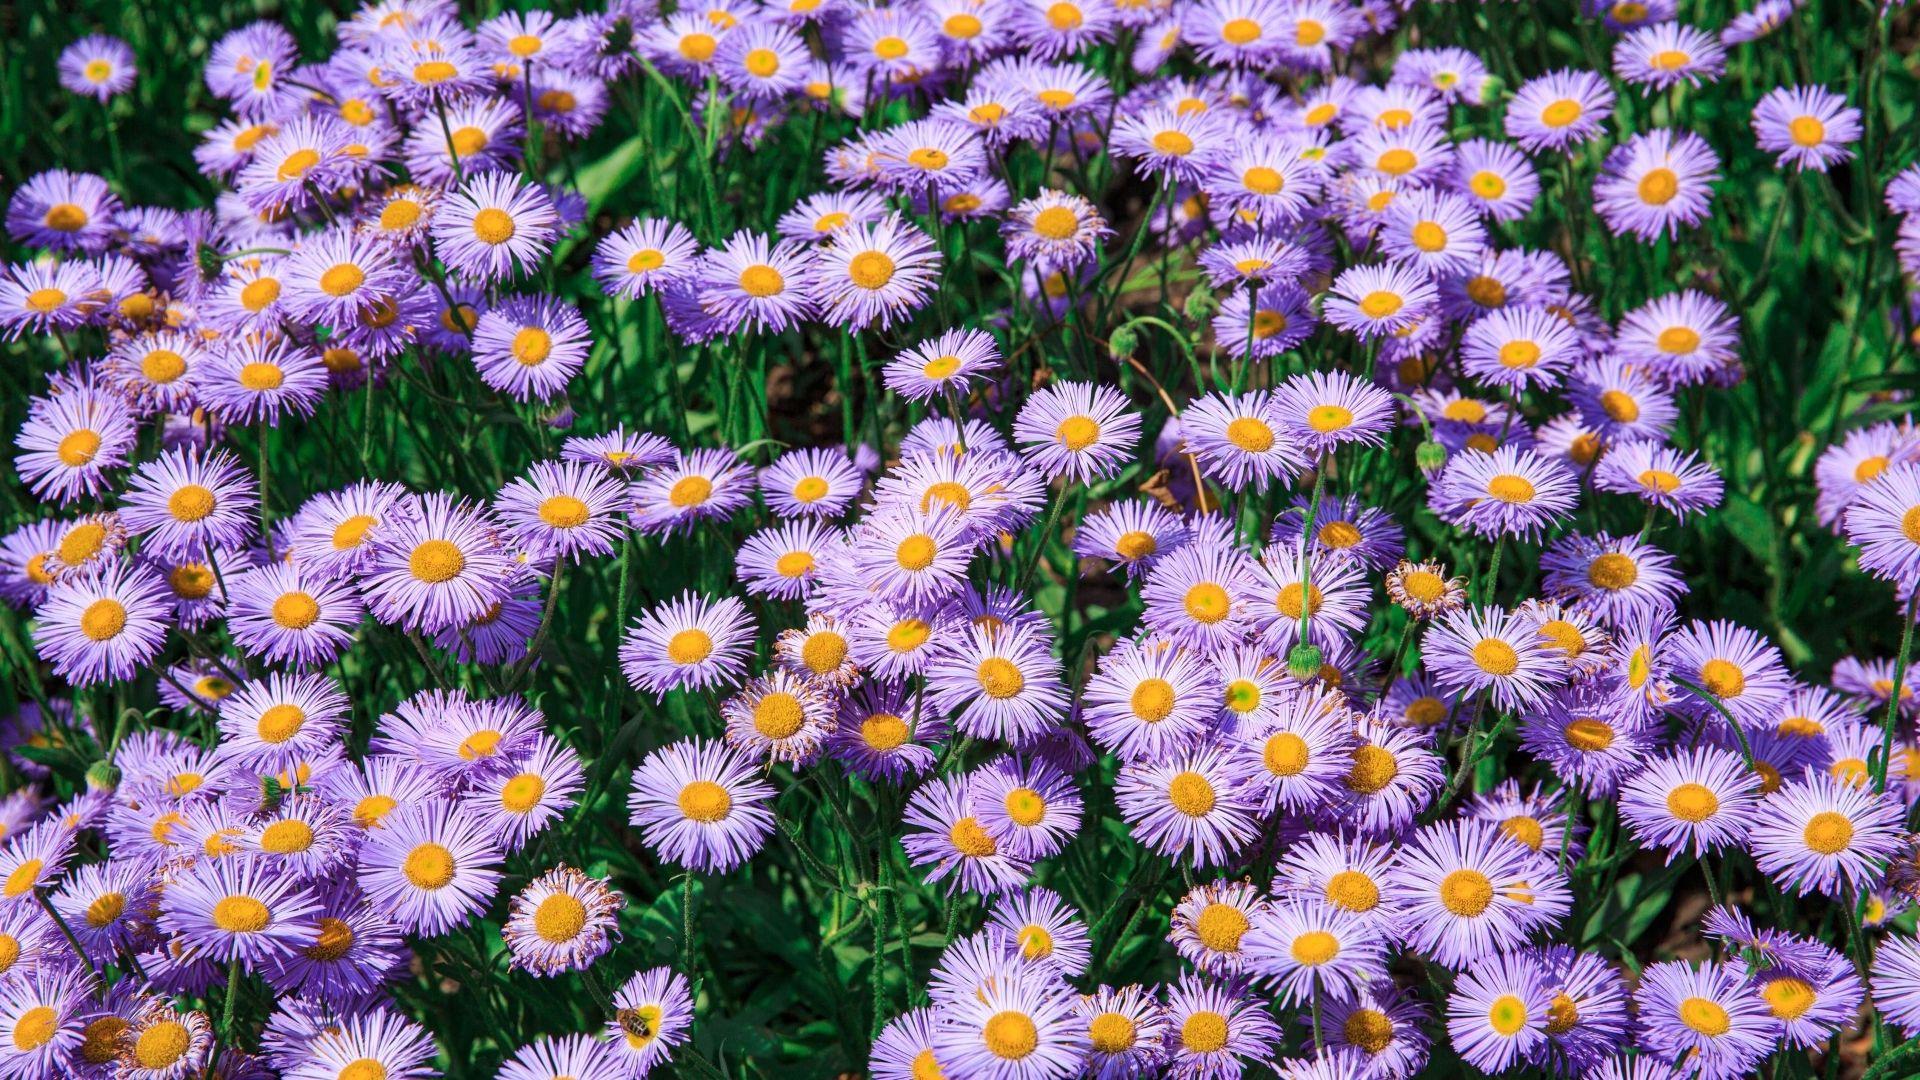 A field of Aster novae-angliae (Purple Dome Aster).